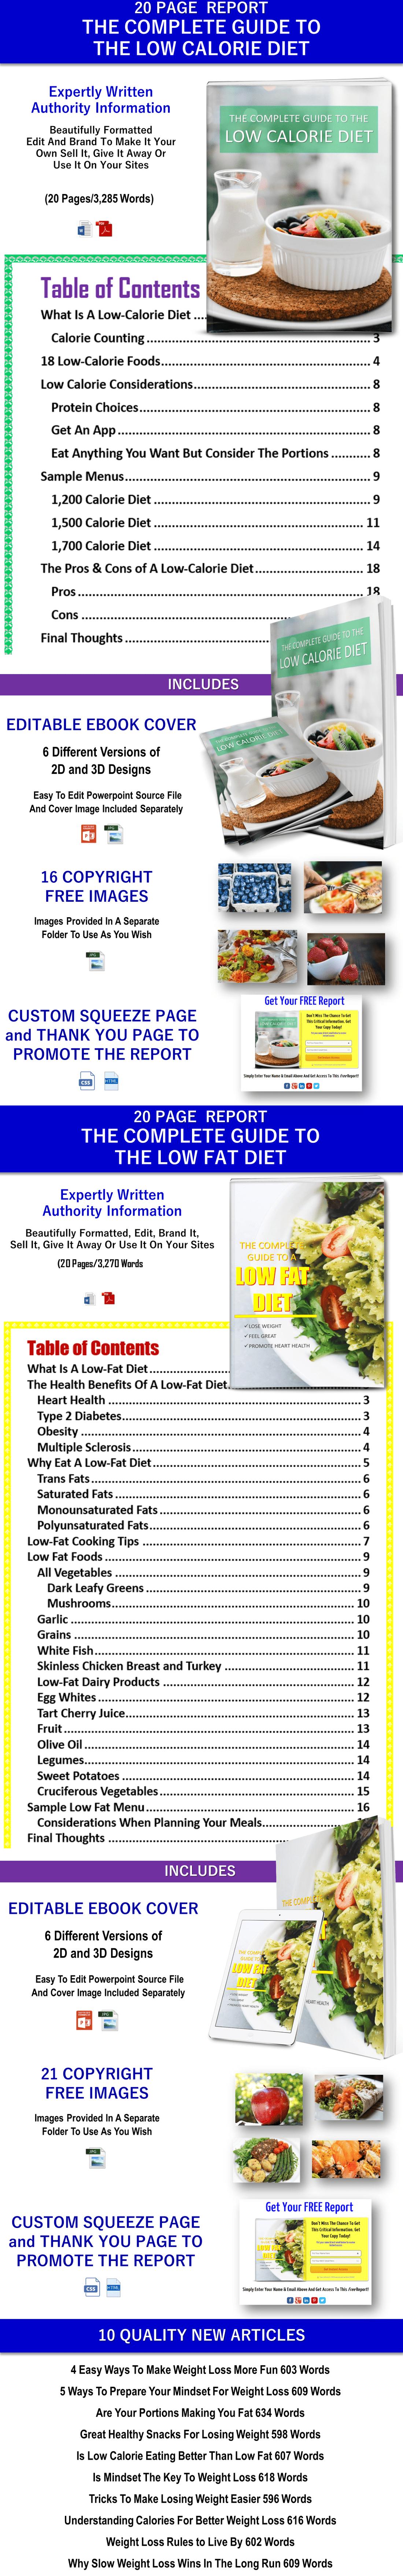 Low Calorie Diet Report, Low Fat Diet Report and 10 Diet Articles PLR